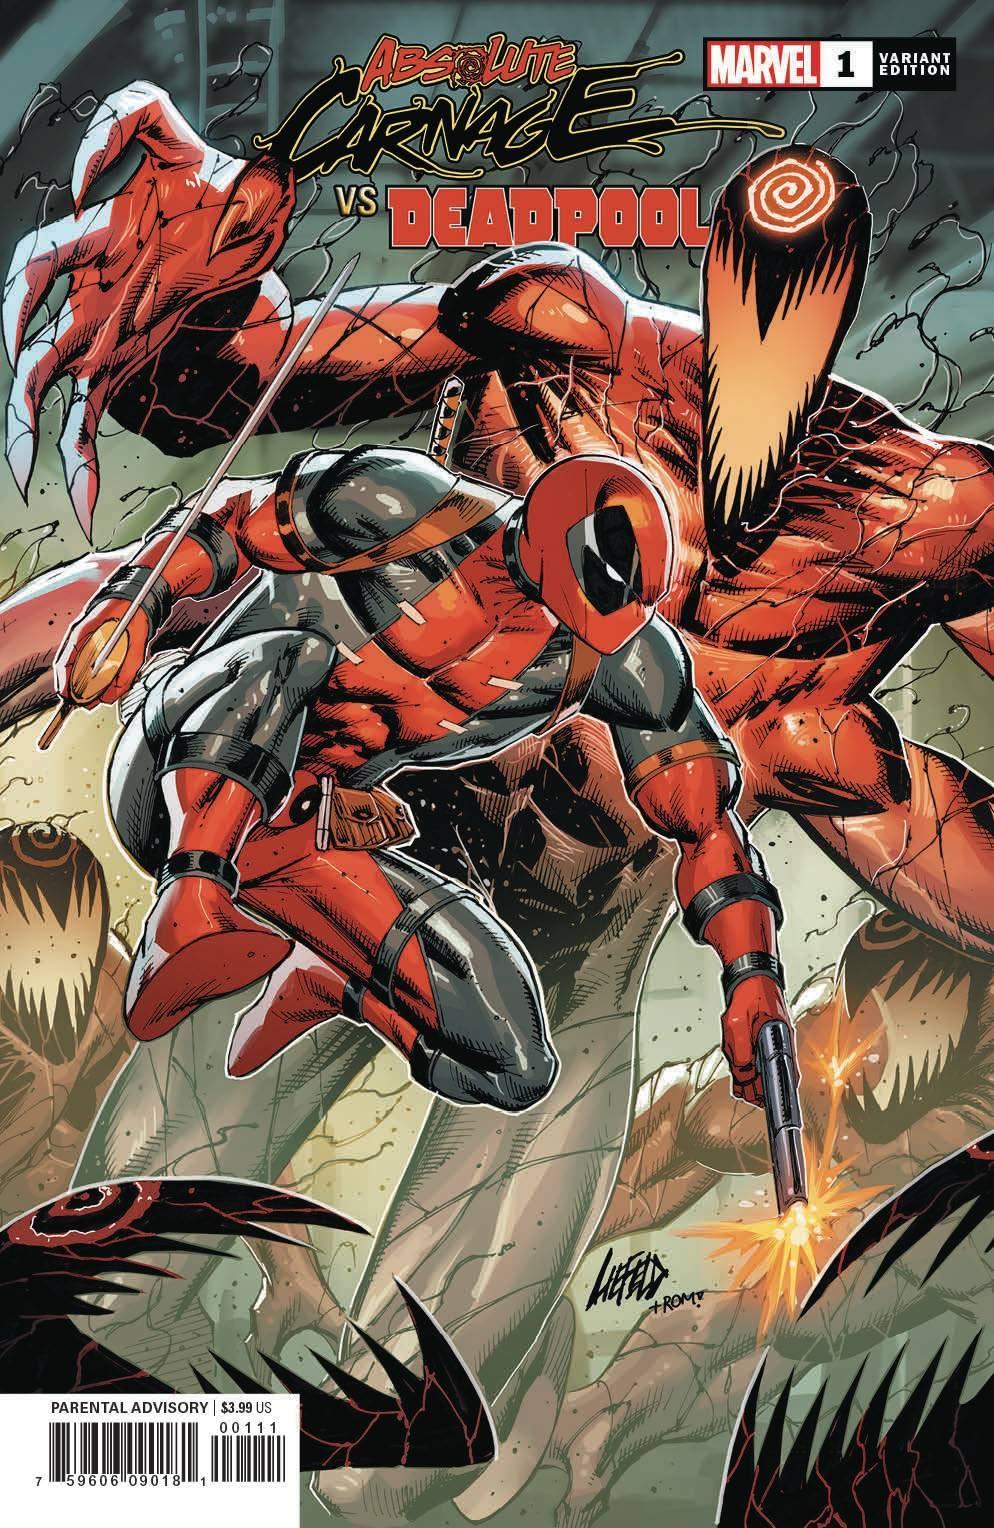 Absolute Carnage vs Deadpool #1 Marvel Comics 2019 Liefeld Variant of 3